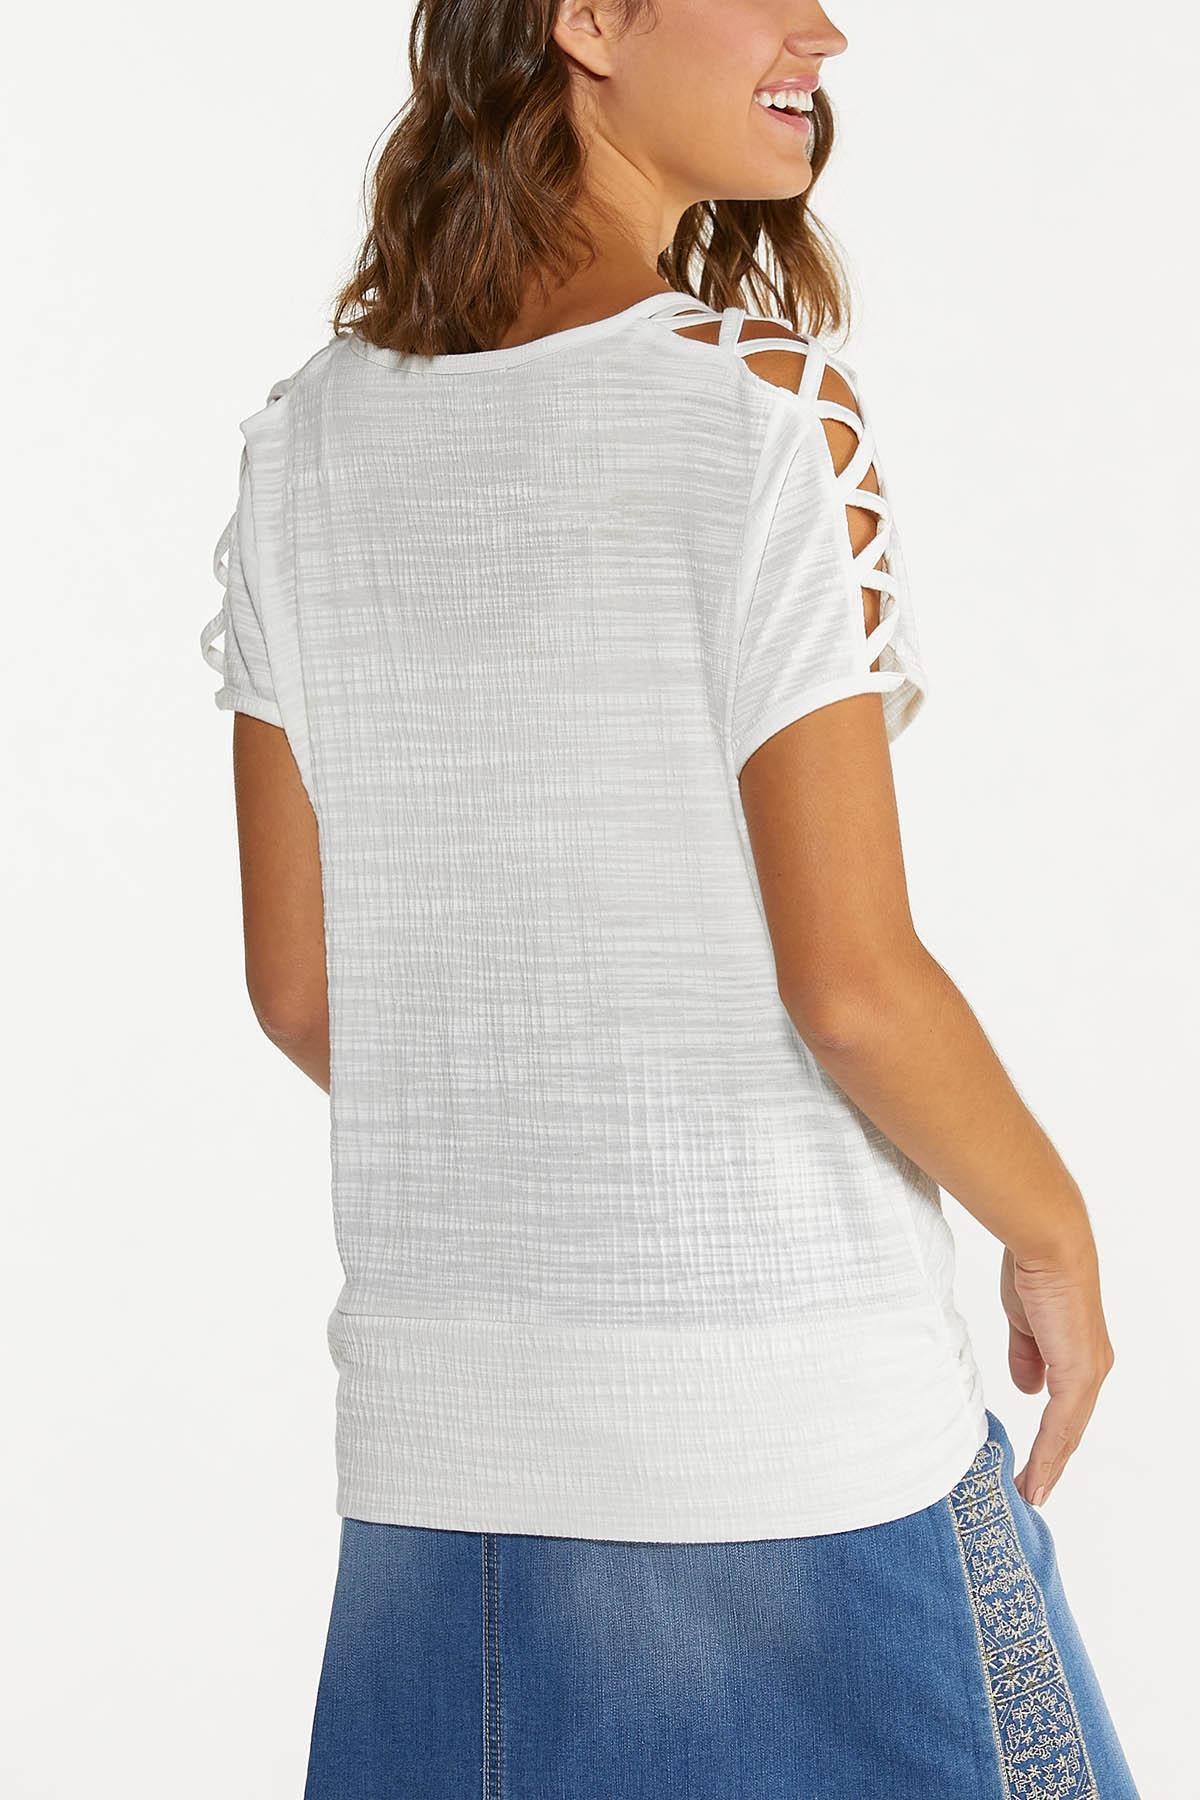 Criss Cross Cutout Sleeve Top (Item #44711405)